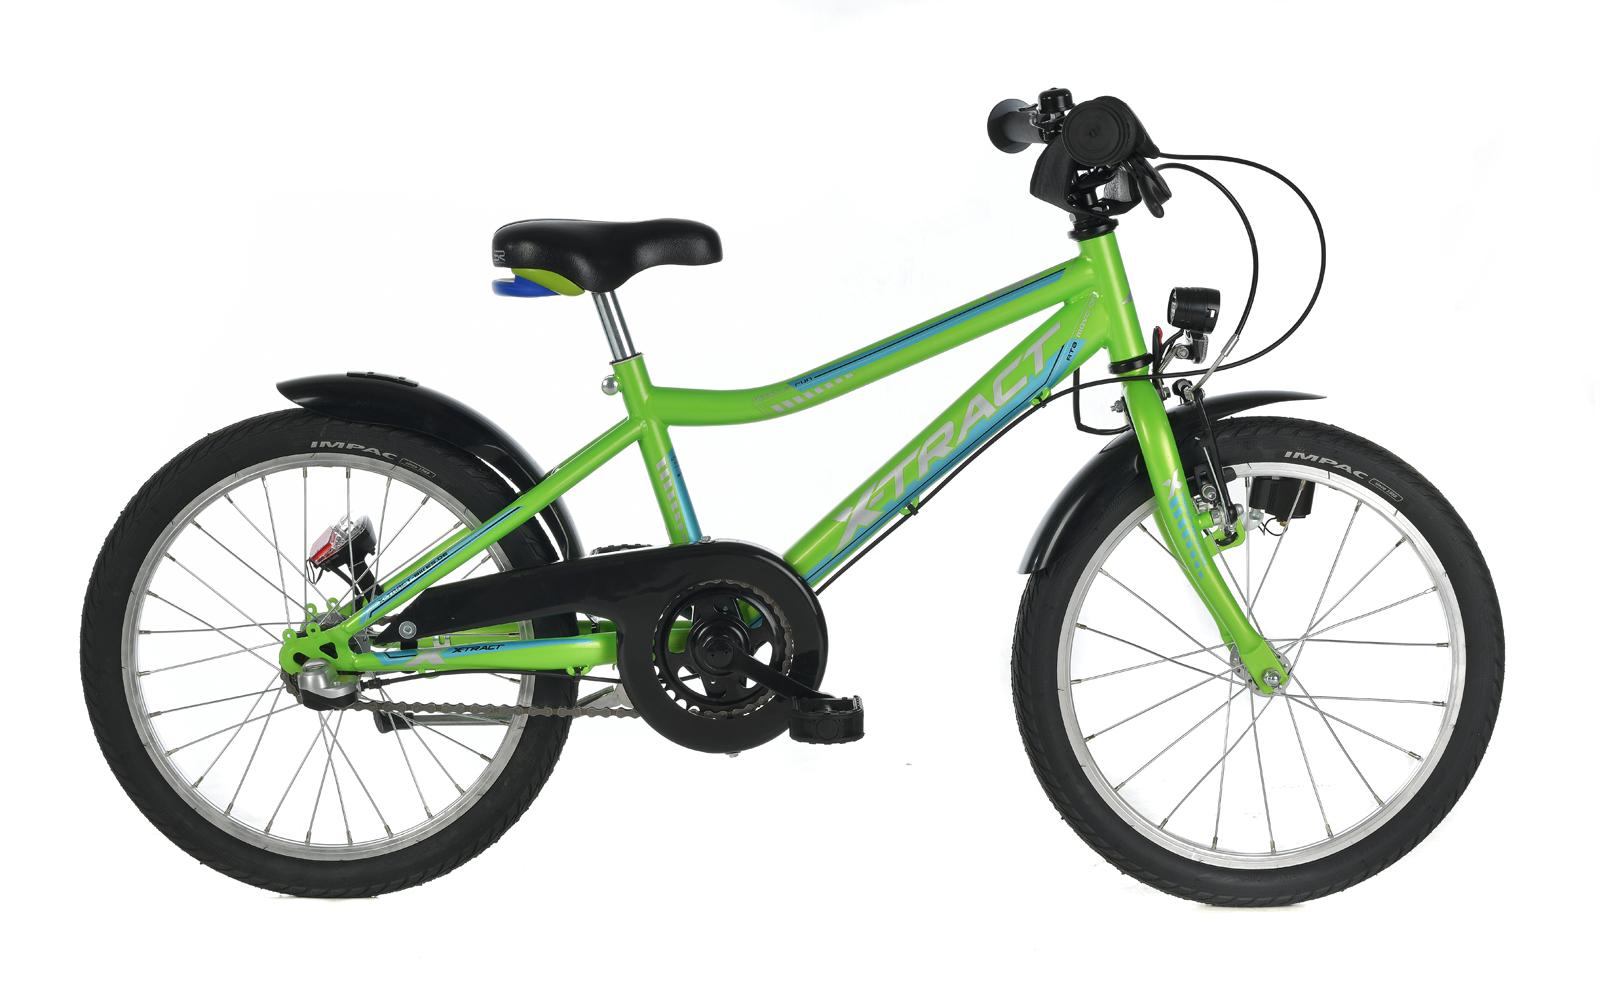 X Tract Atb 18 20 Zoll Feldmeier Bikes